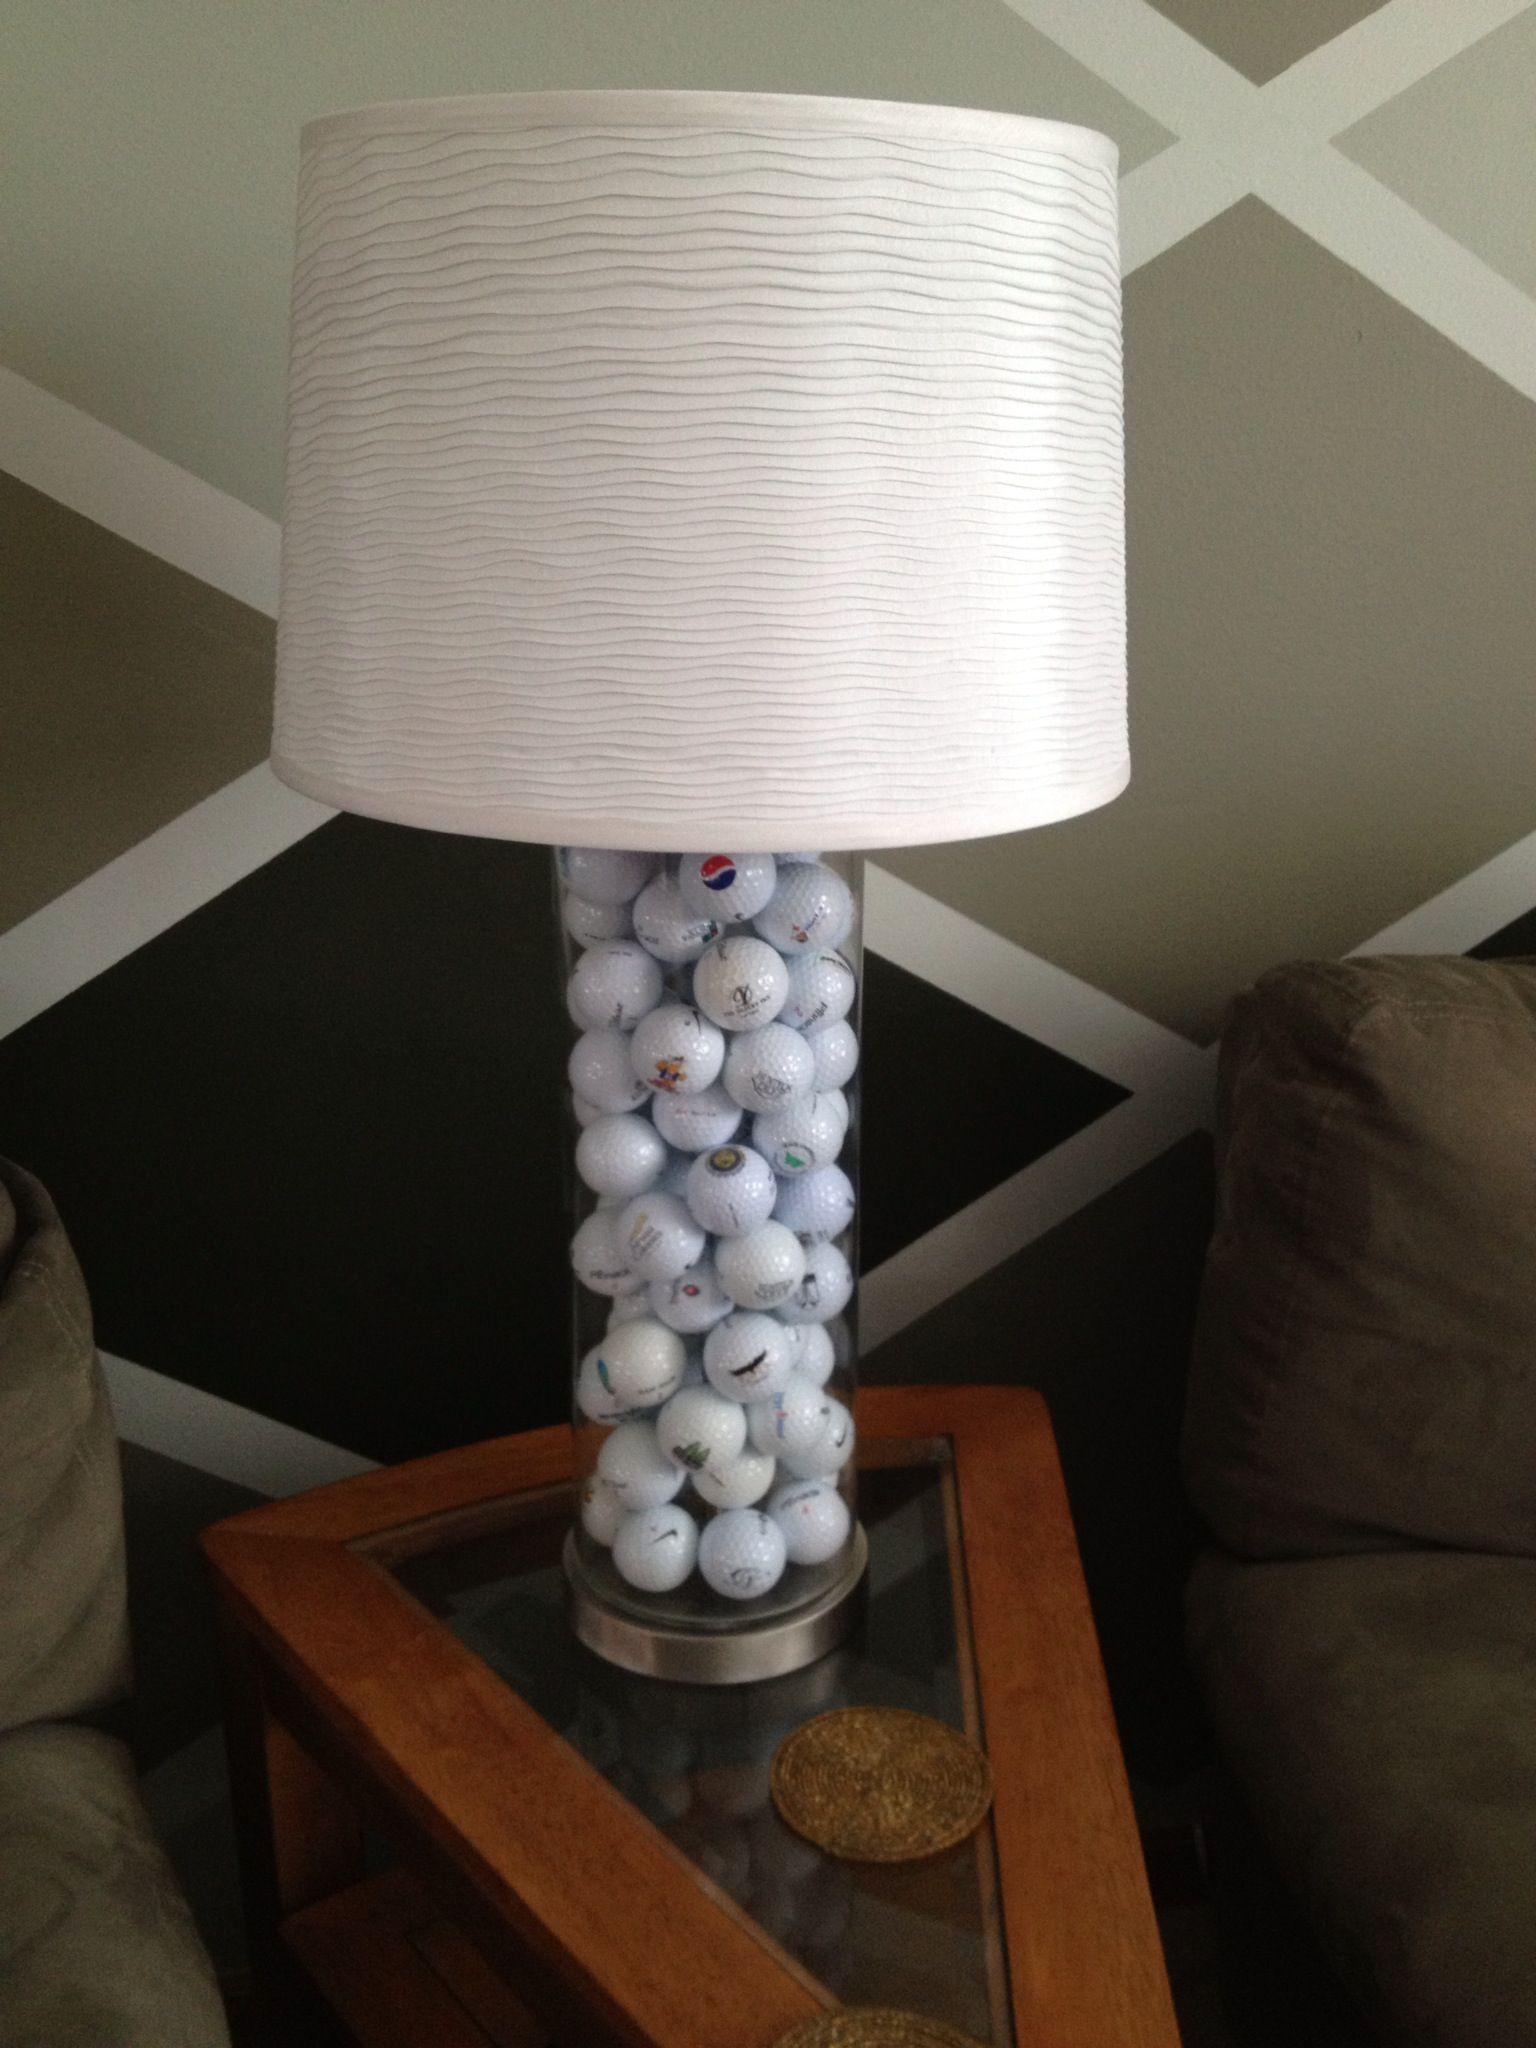 Logo Golf Ball Lamp Those 20 Years Of Saving Logo Balls Pays Off Ball Lamps Golf Decor Lamp